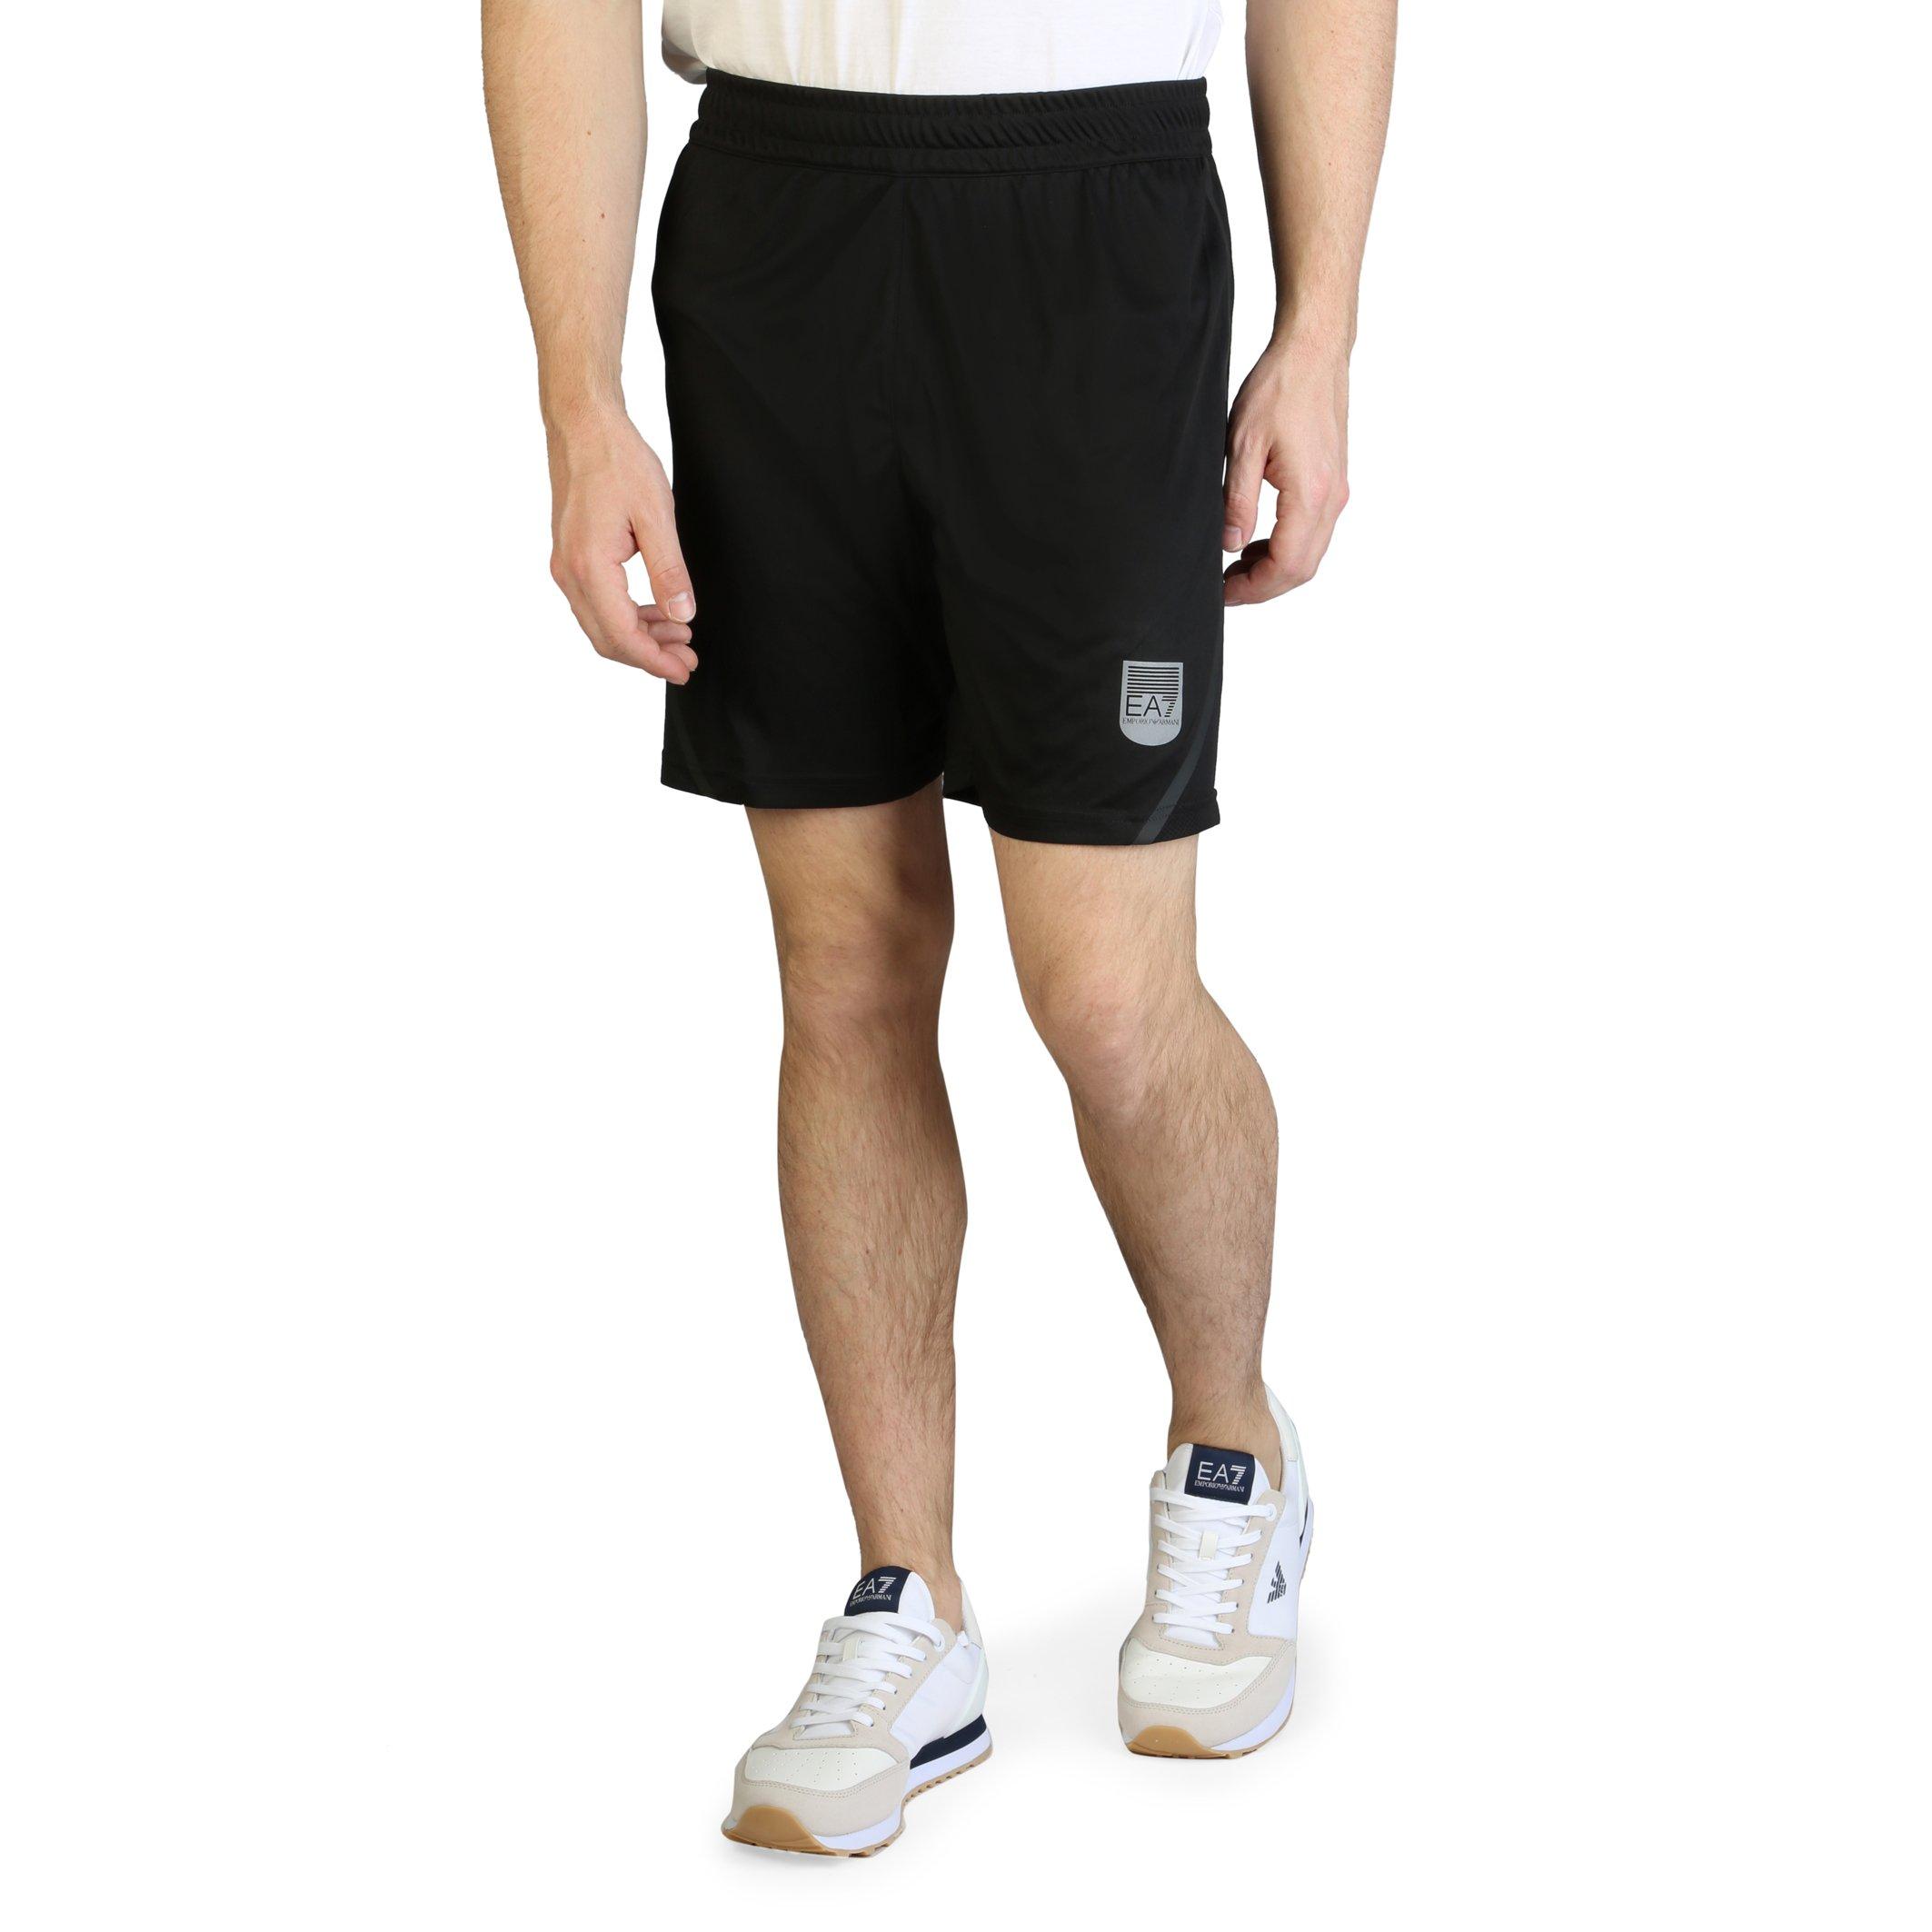 EA7 Men's Short White 3GPS66_PJH6Z - black S